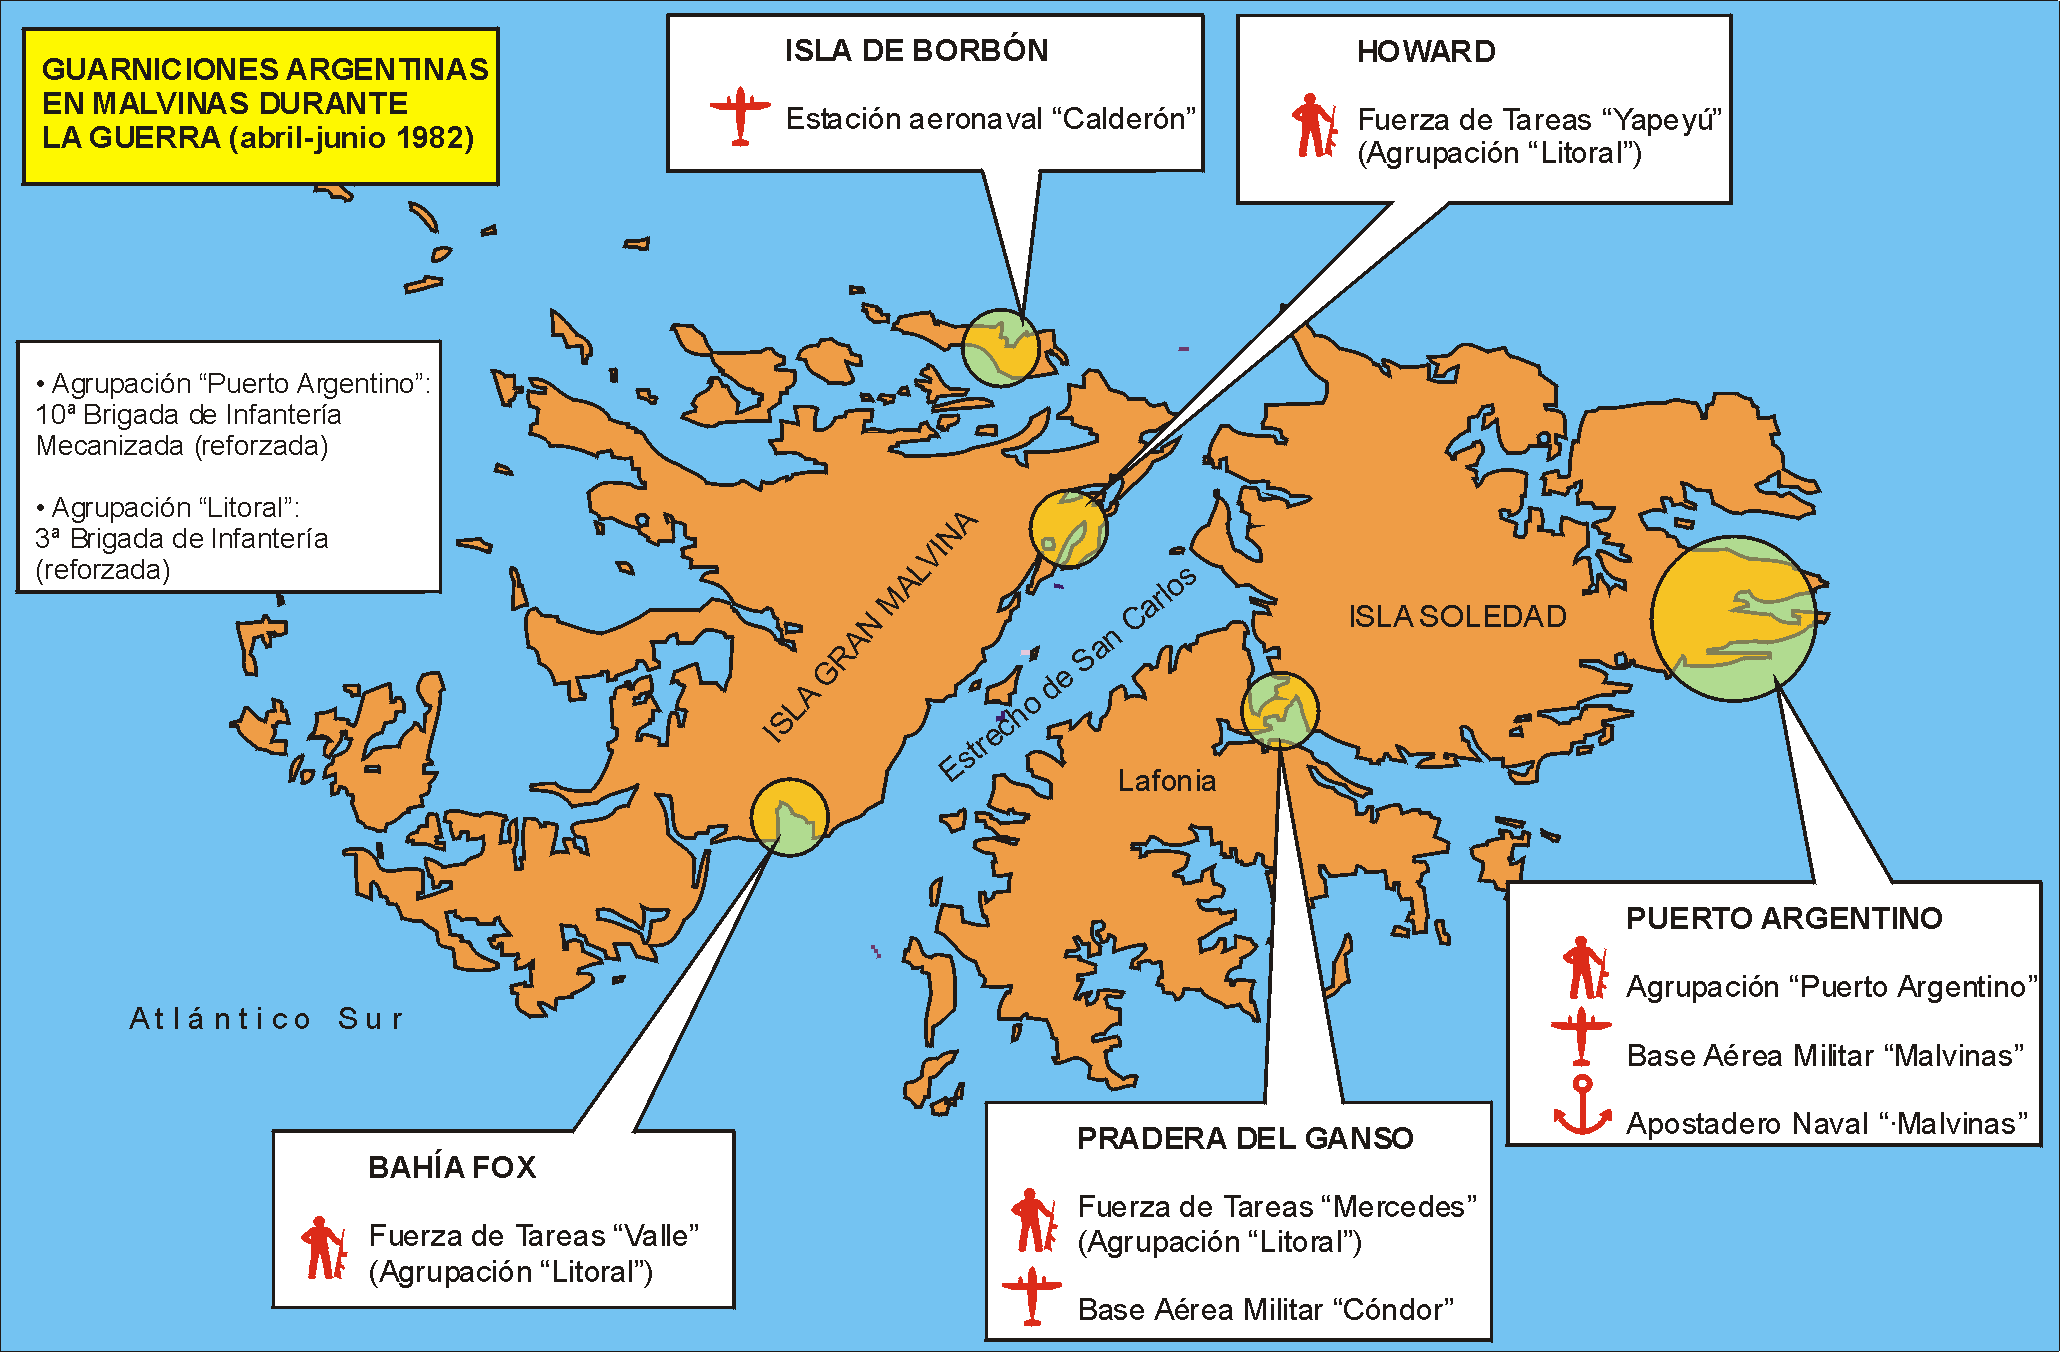 HMS Invincible and the Malvinas War in 1982 Mlv_guarn_arg